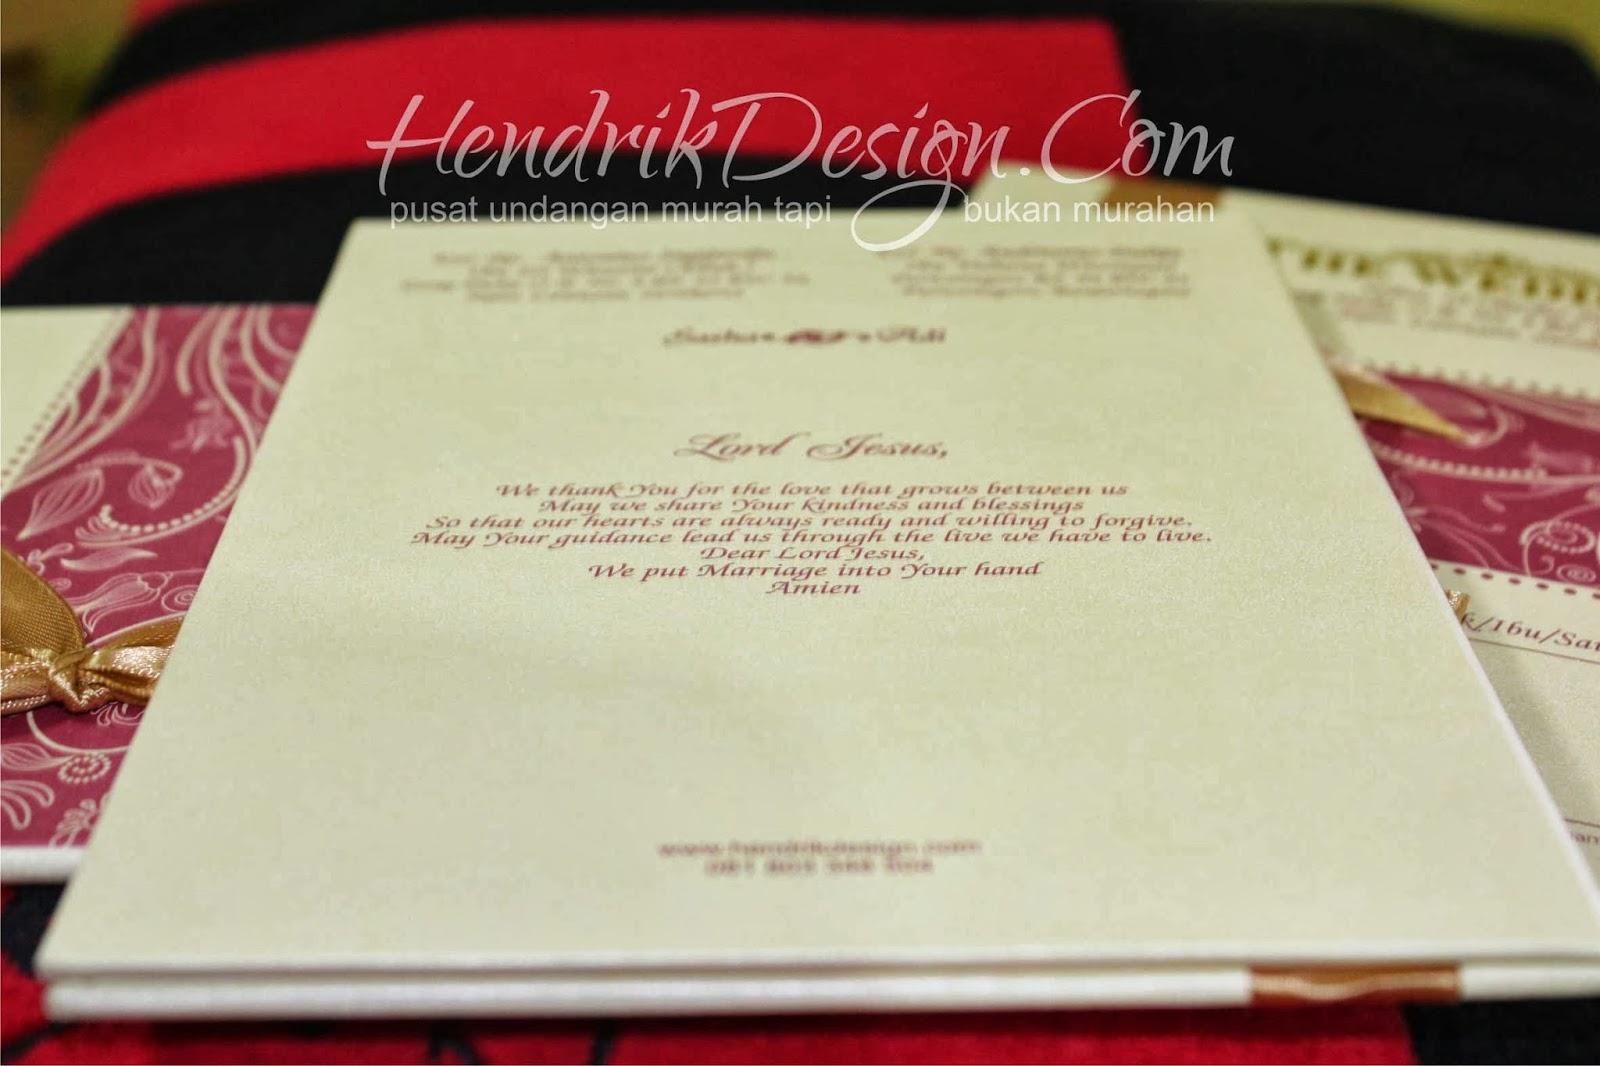 Contoh Undangan Pernikahan Pita Pink Depan (HCGD-13)